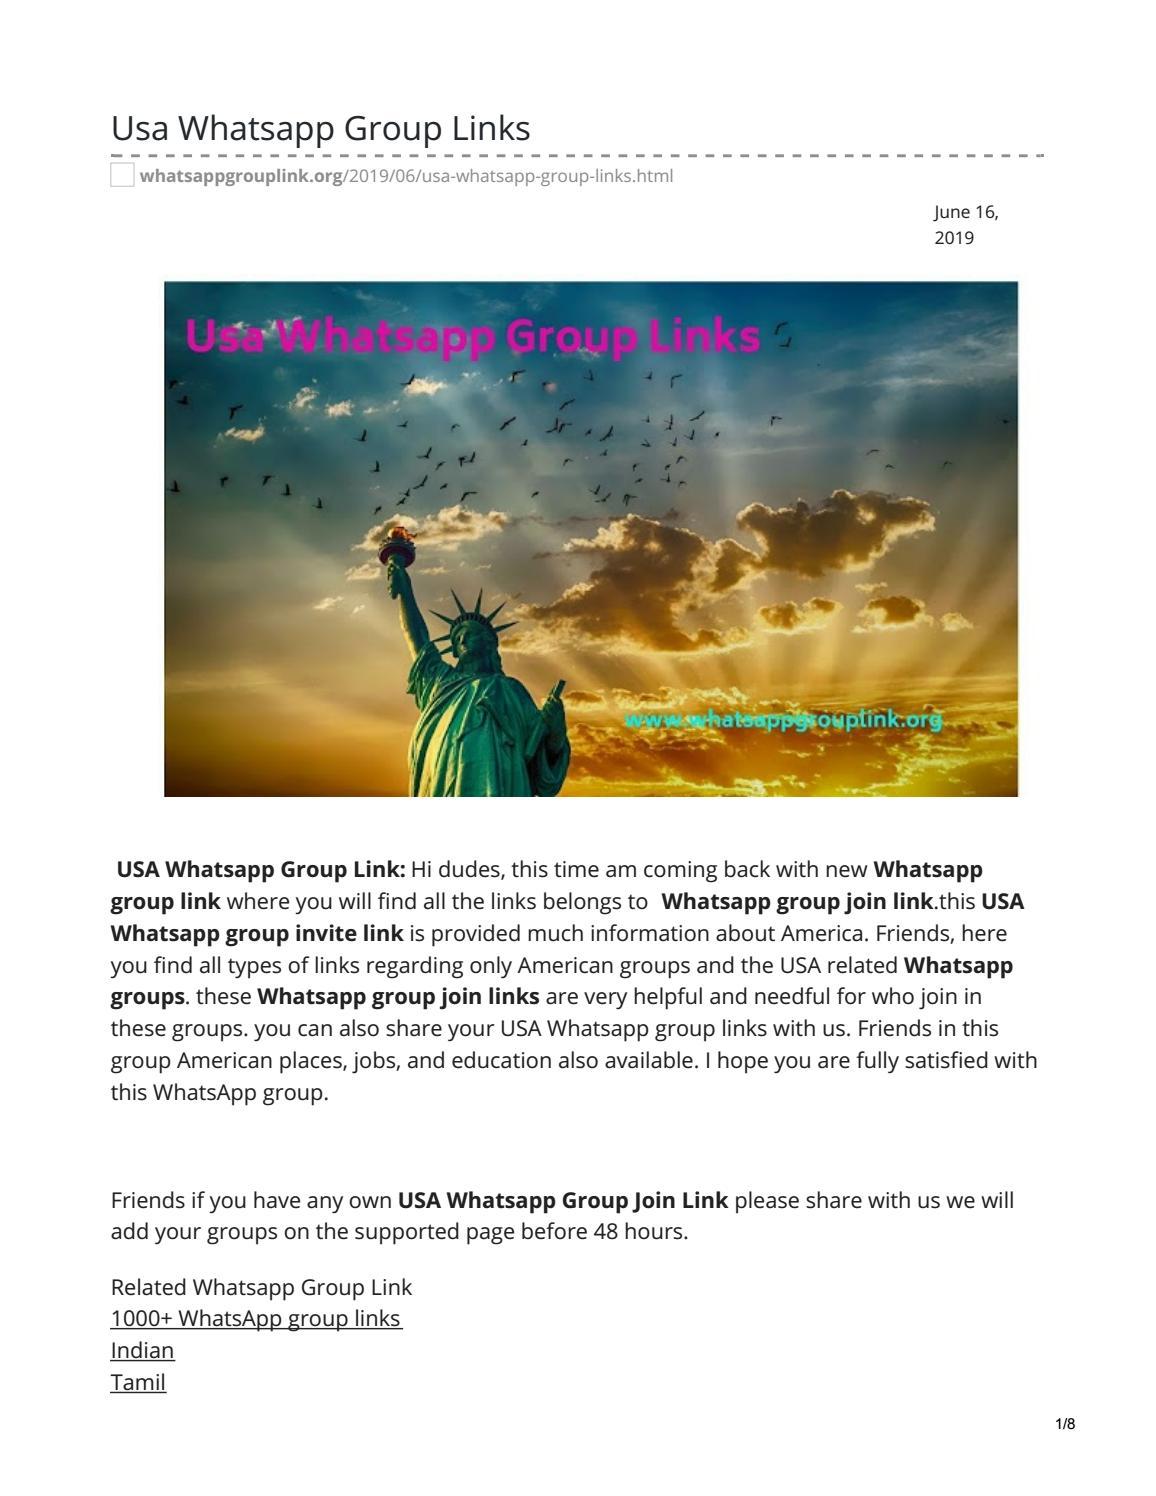 Rose Glen North Dakota ⁓ Try These Whatsapp Group Join Link